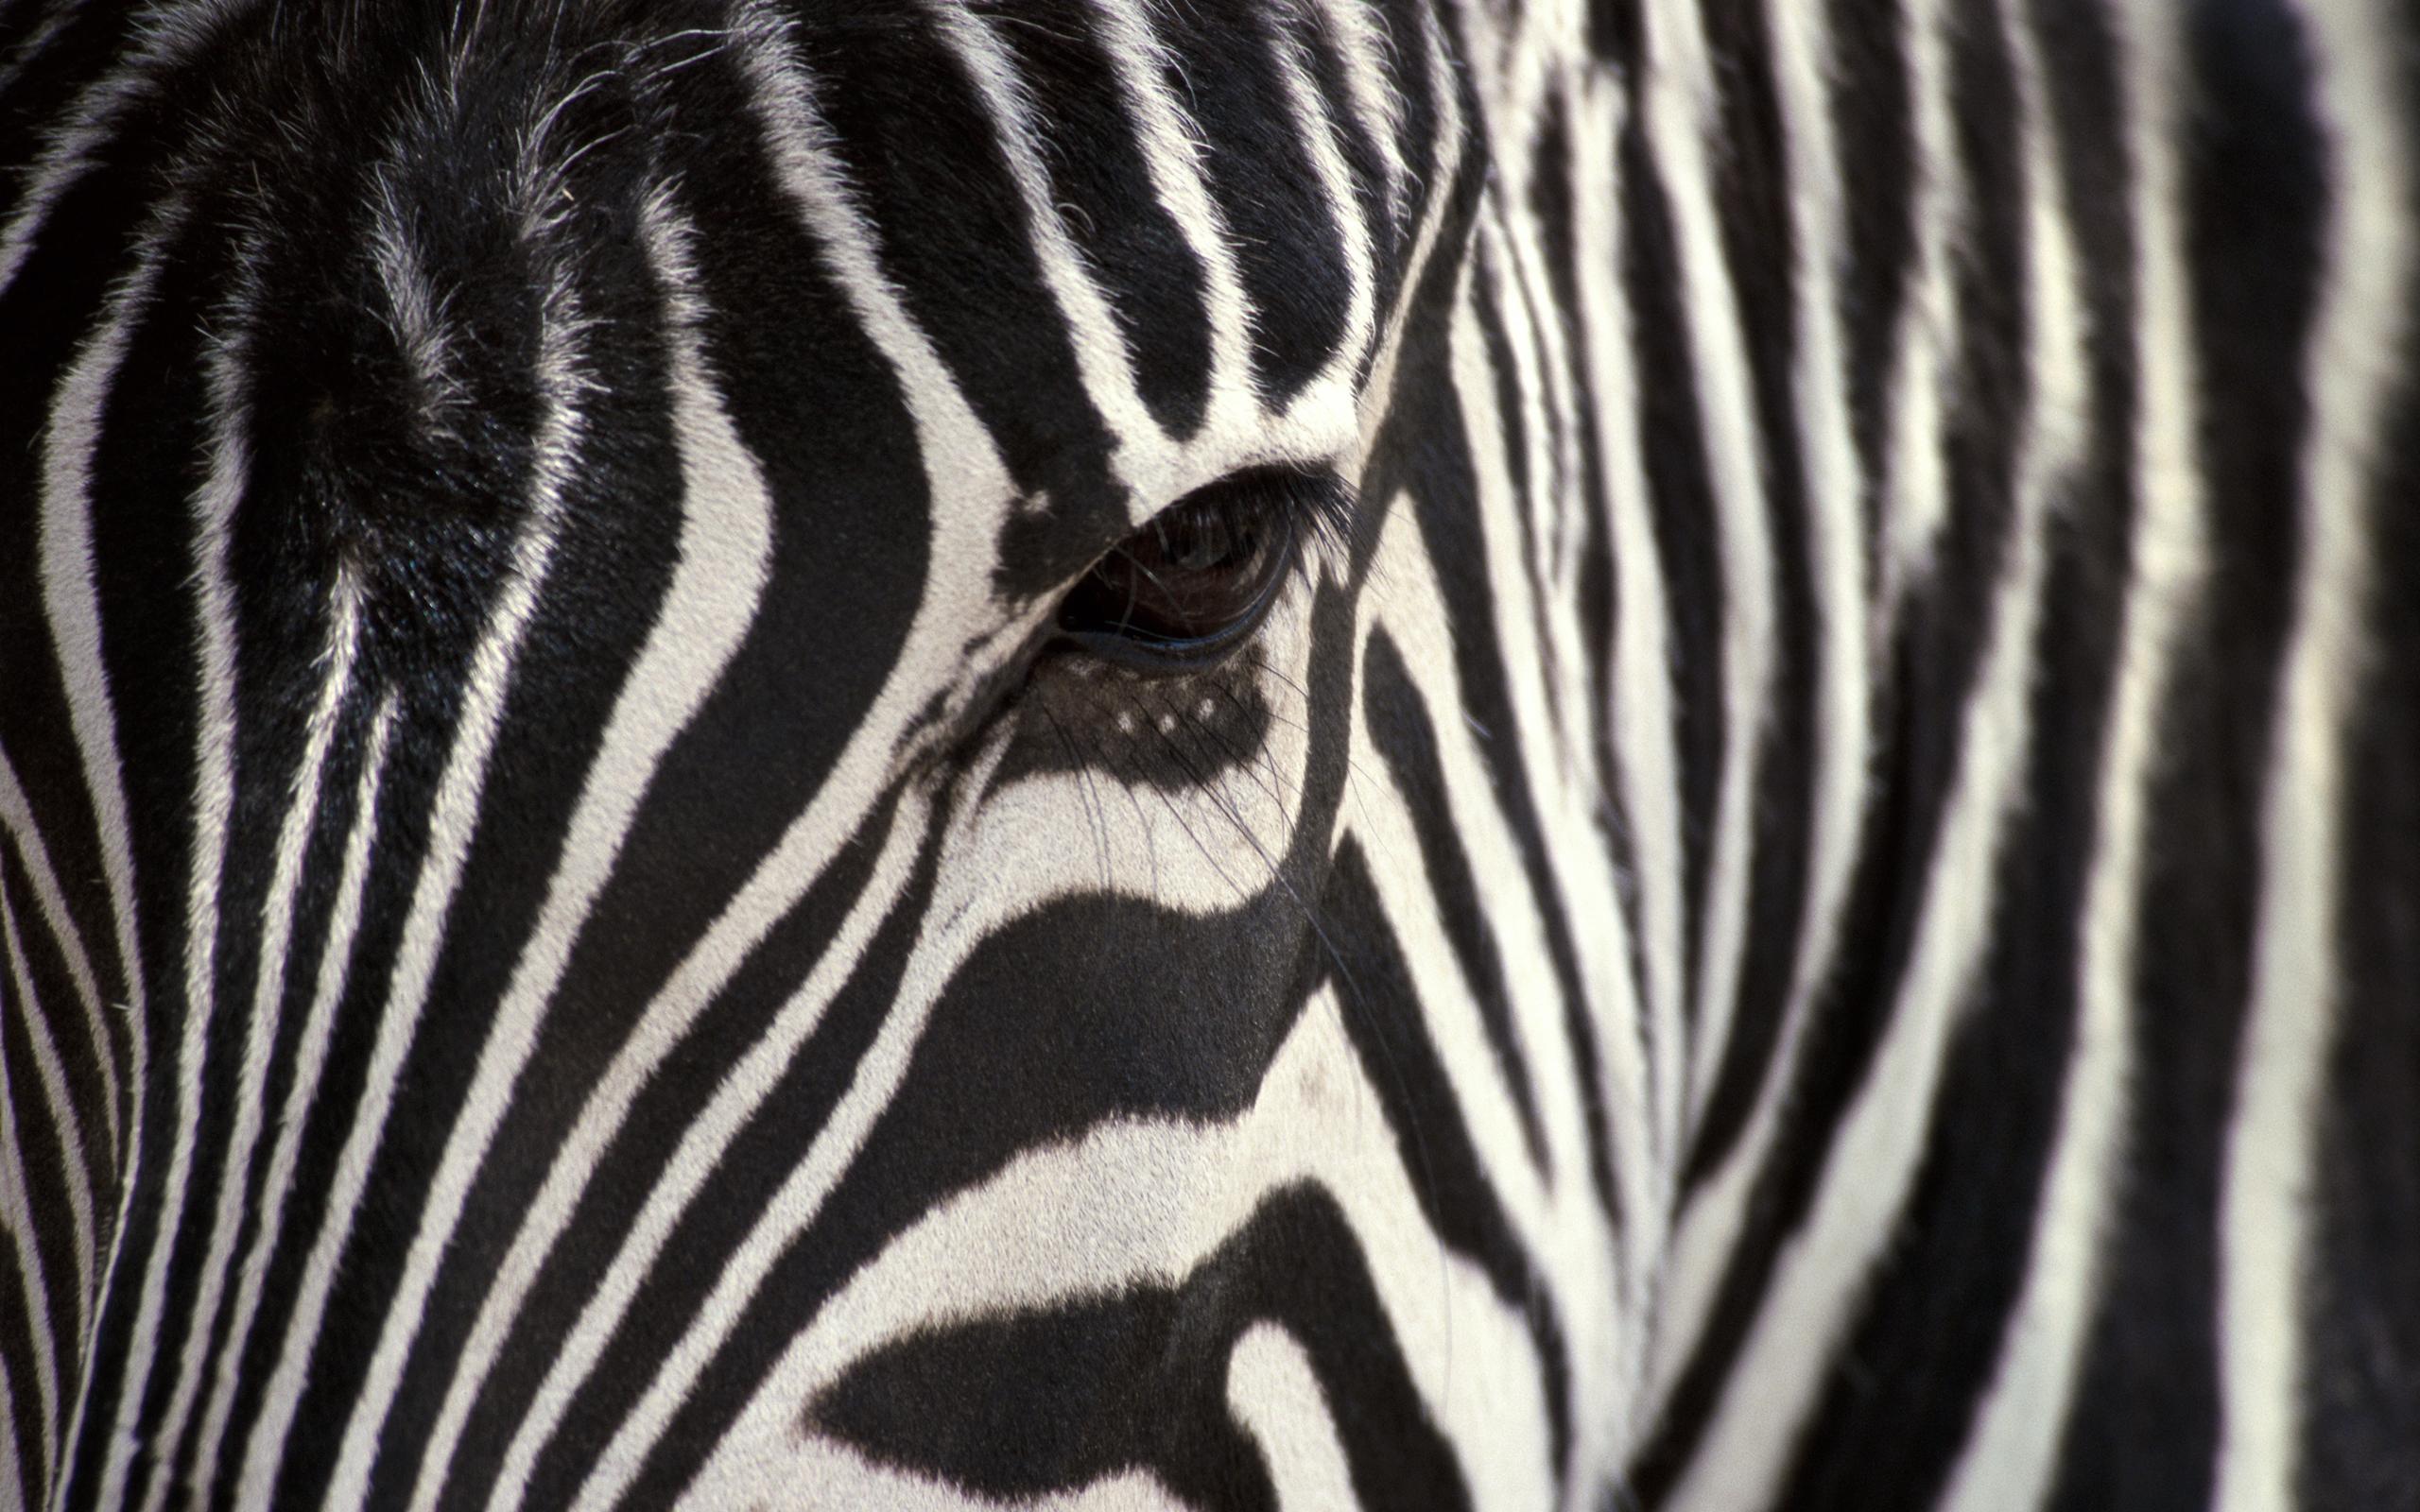 Zebra For Desktop